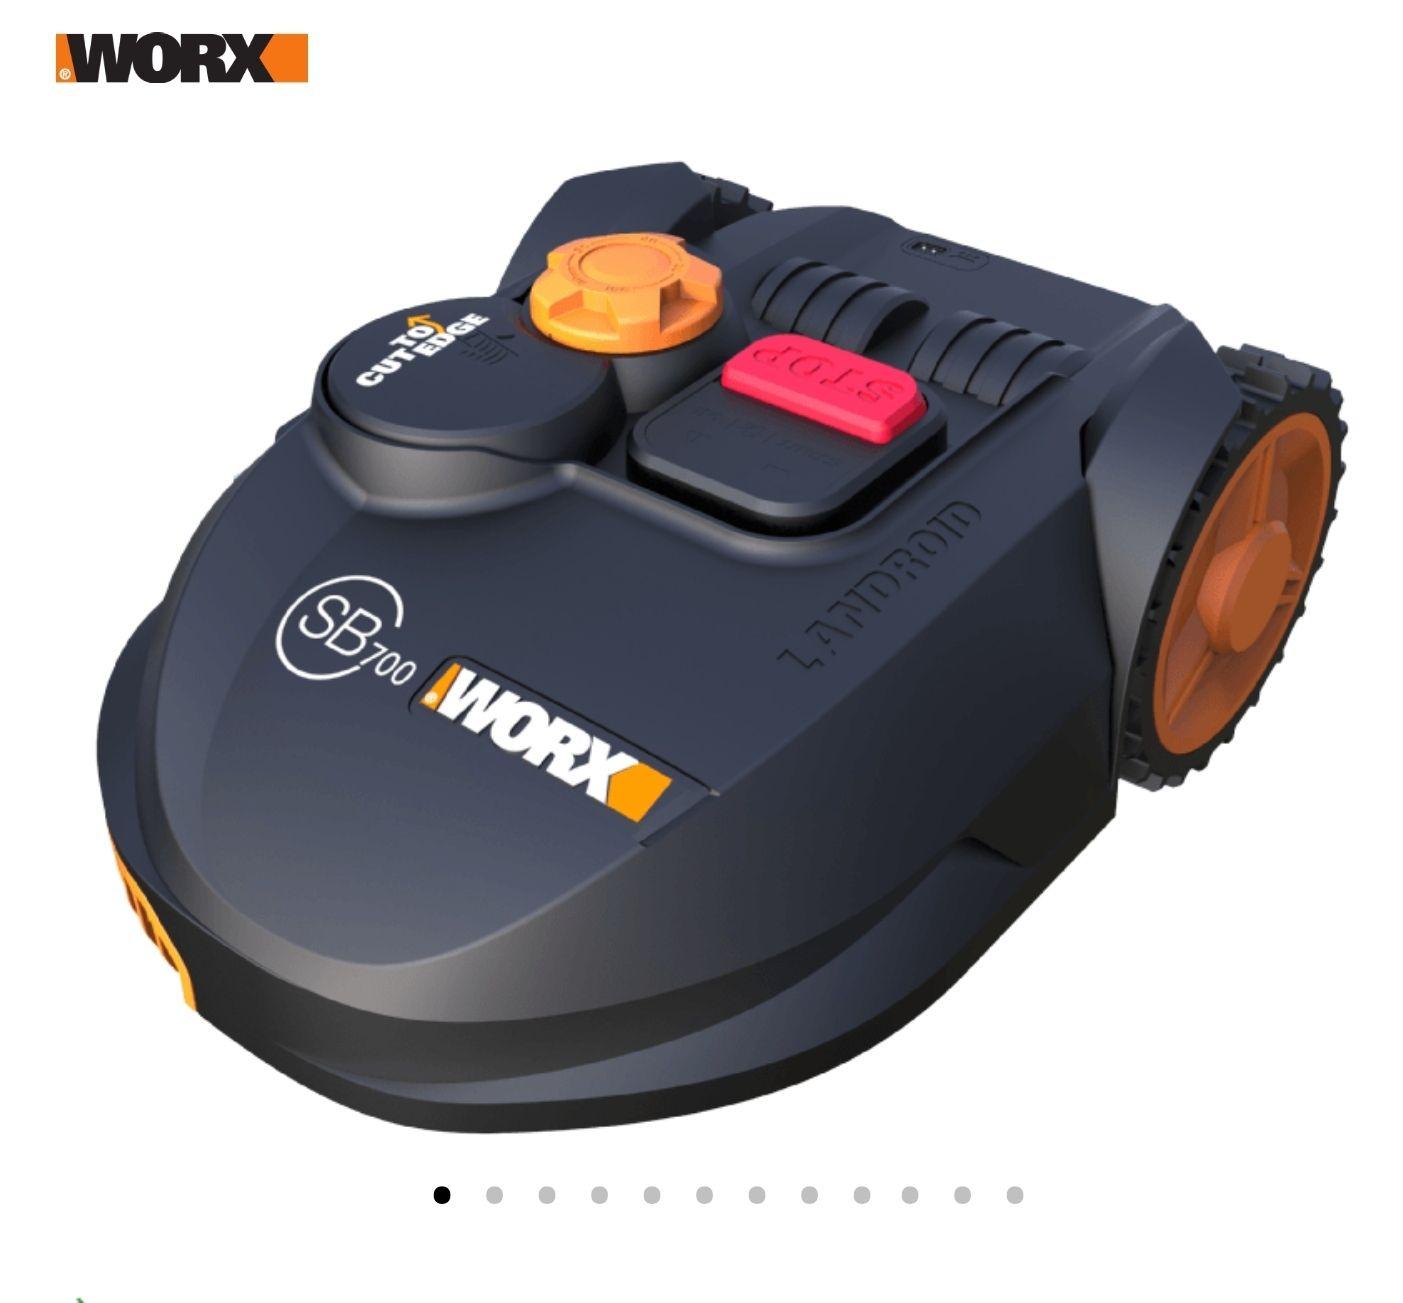 Landroid Worx SB700 Mähroboter